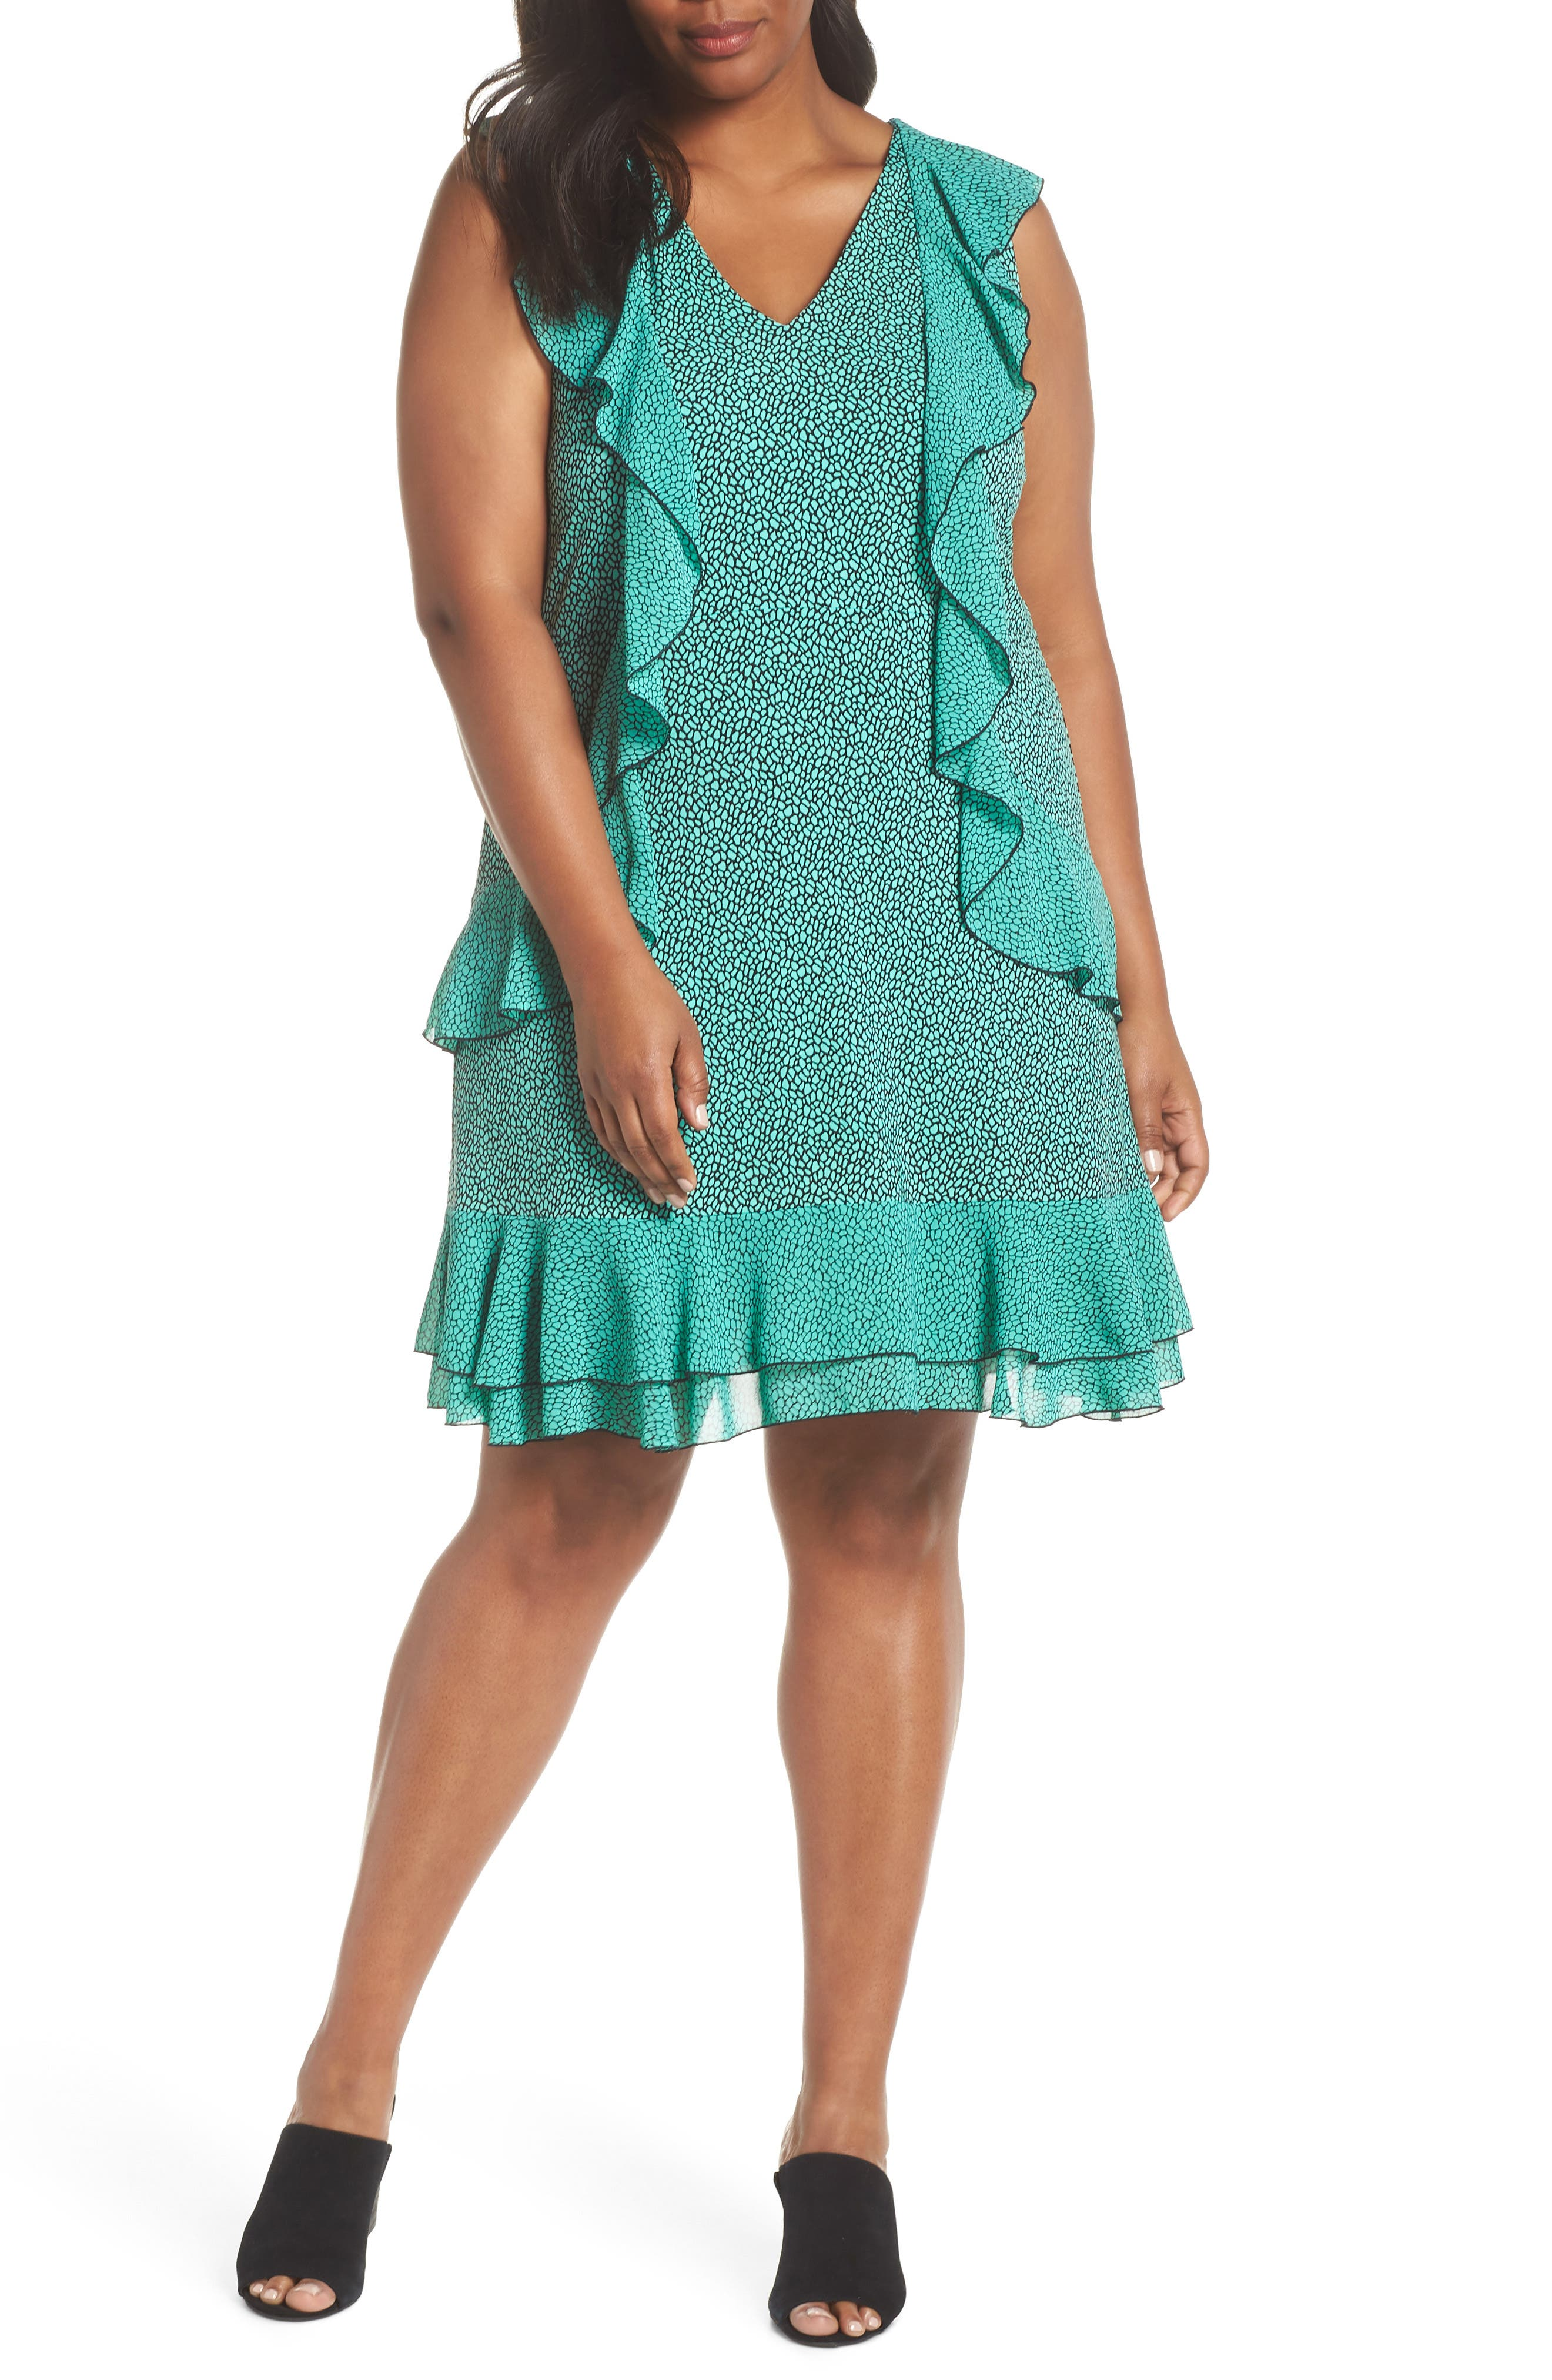 Cascade Ruffle Dress,                             Main thumbnail 1, color,                             AQUA/ BLACK